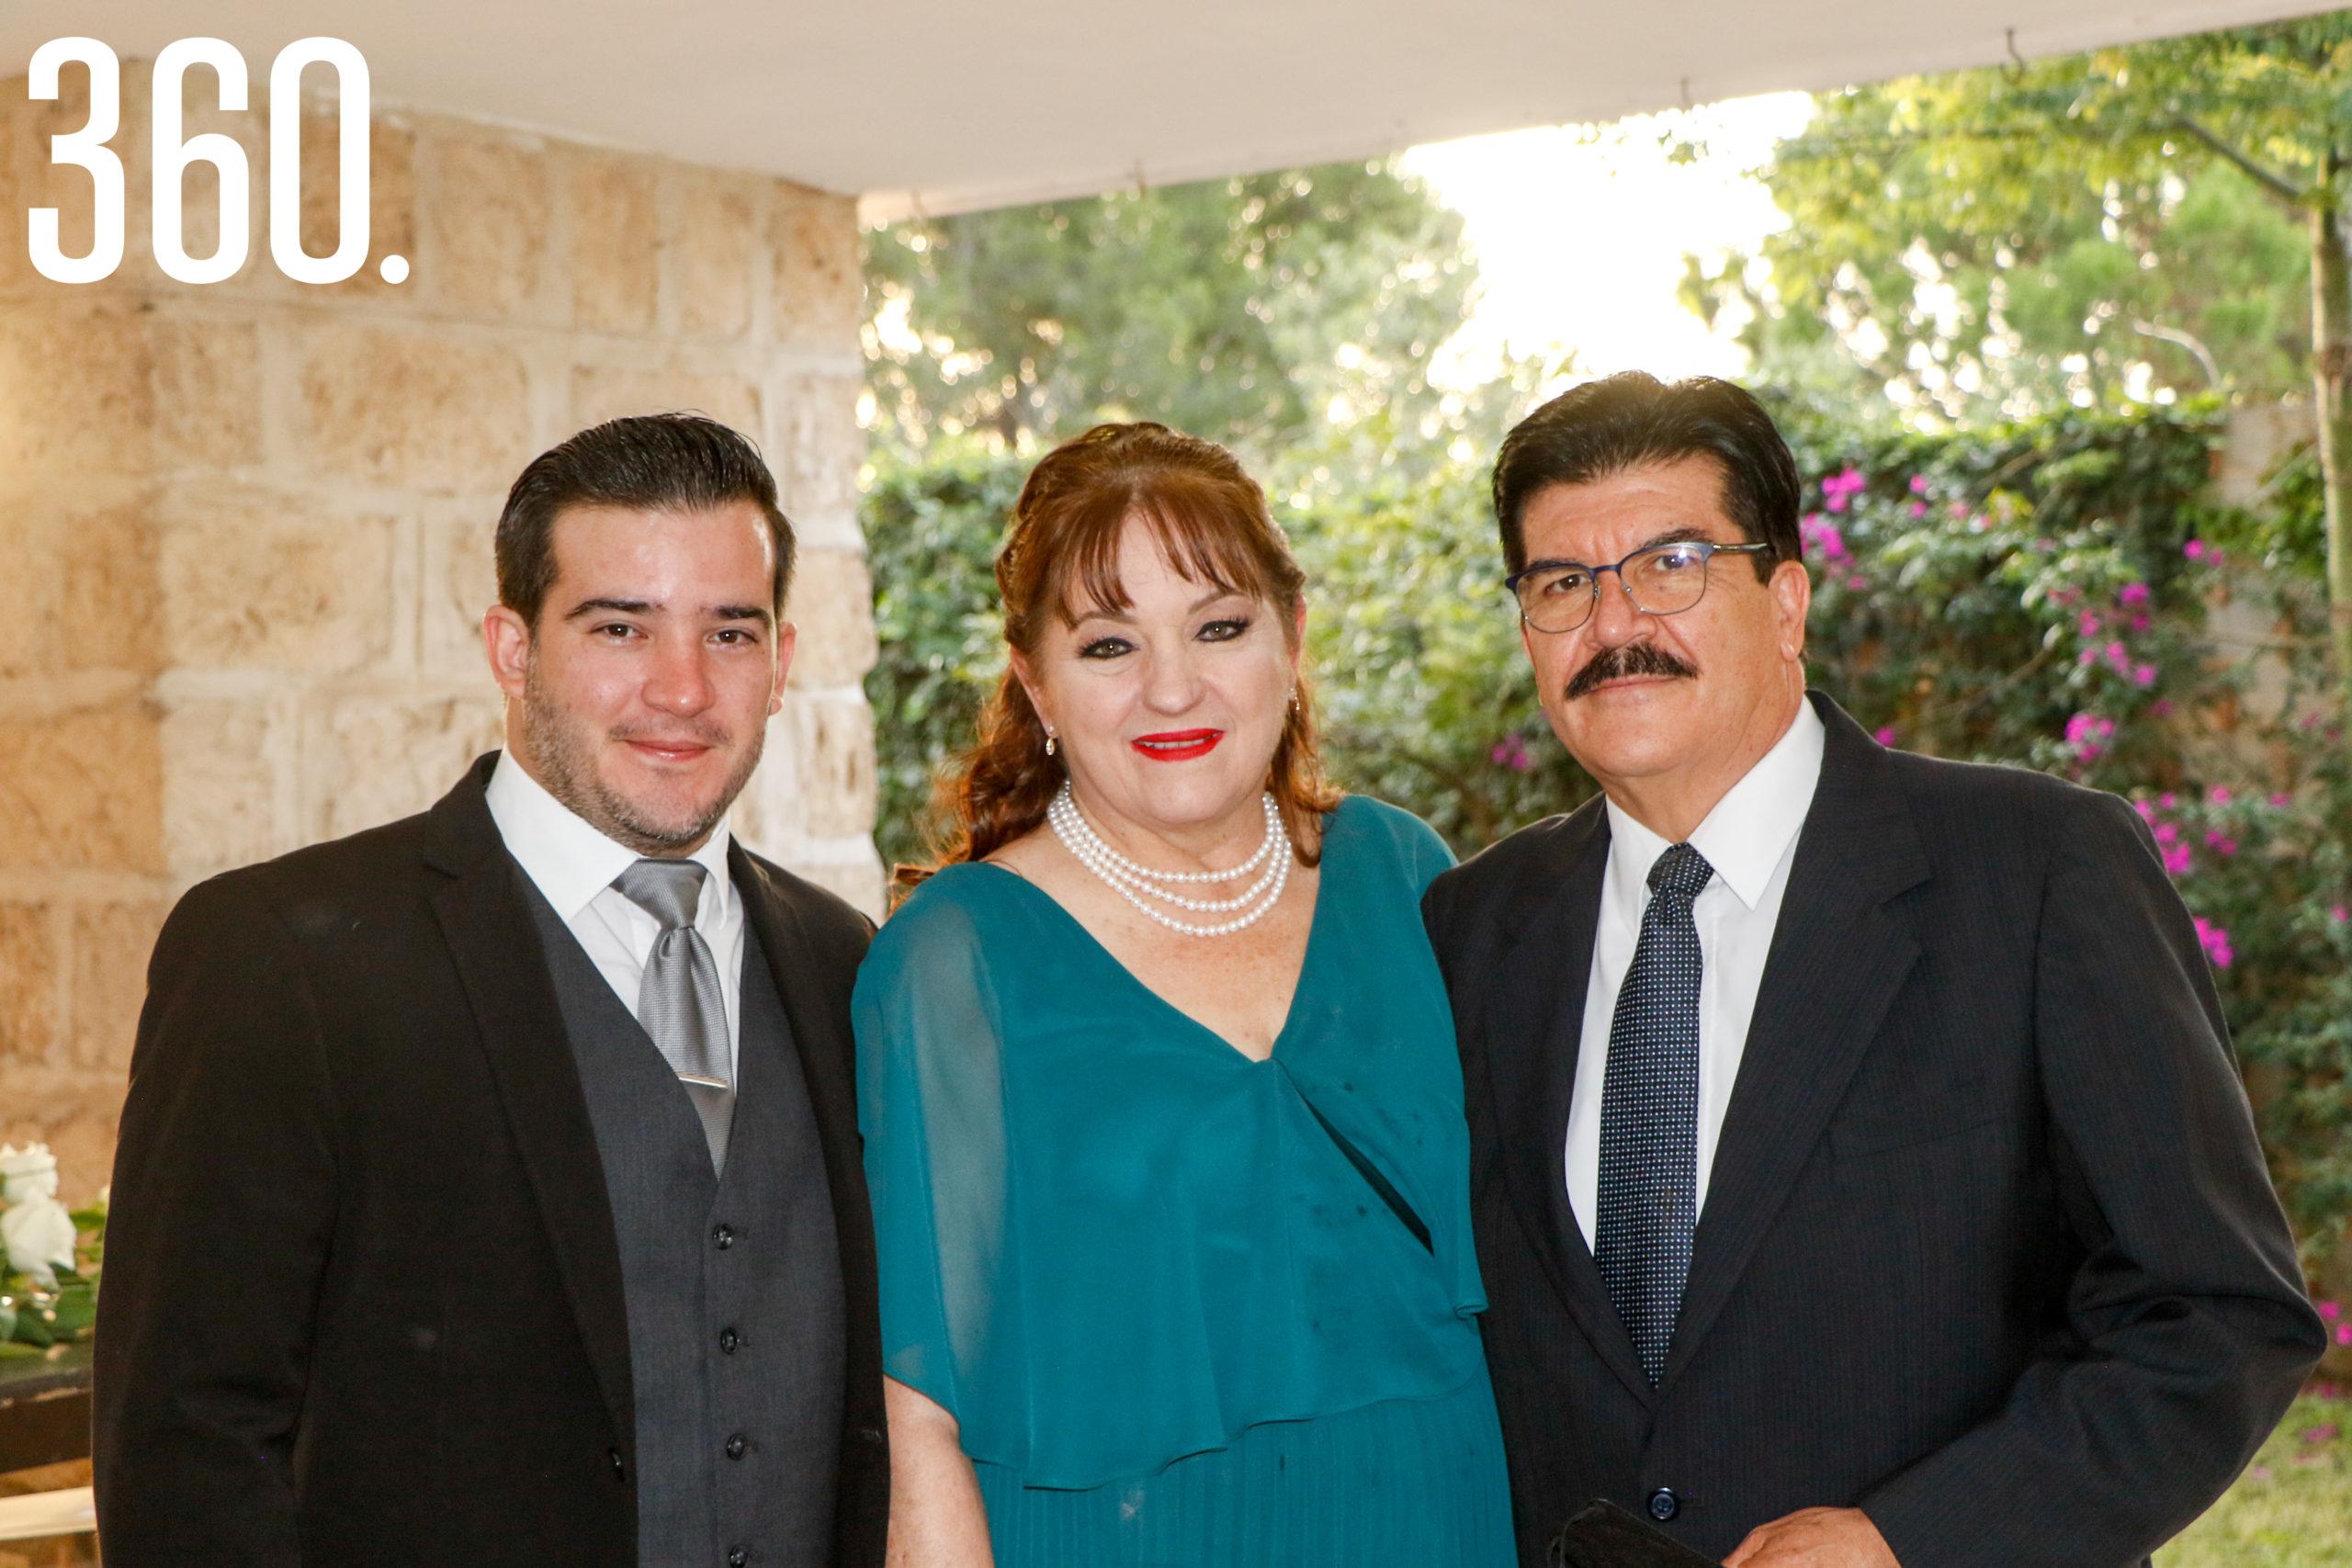 Gaspar Reyes, Sandra Peart y Gaspar Reyes.